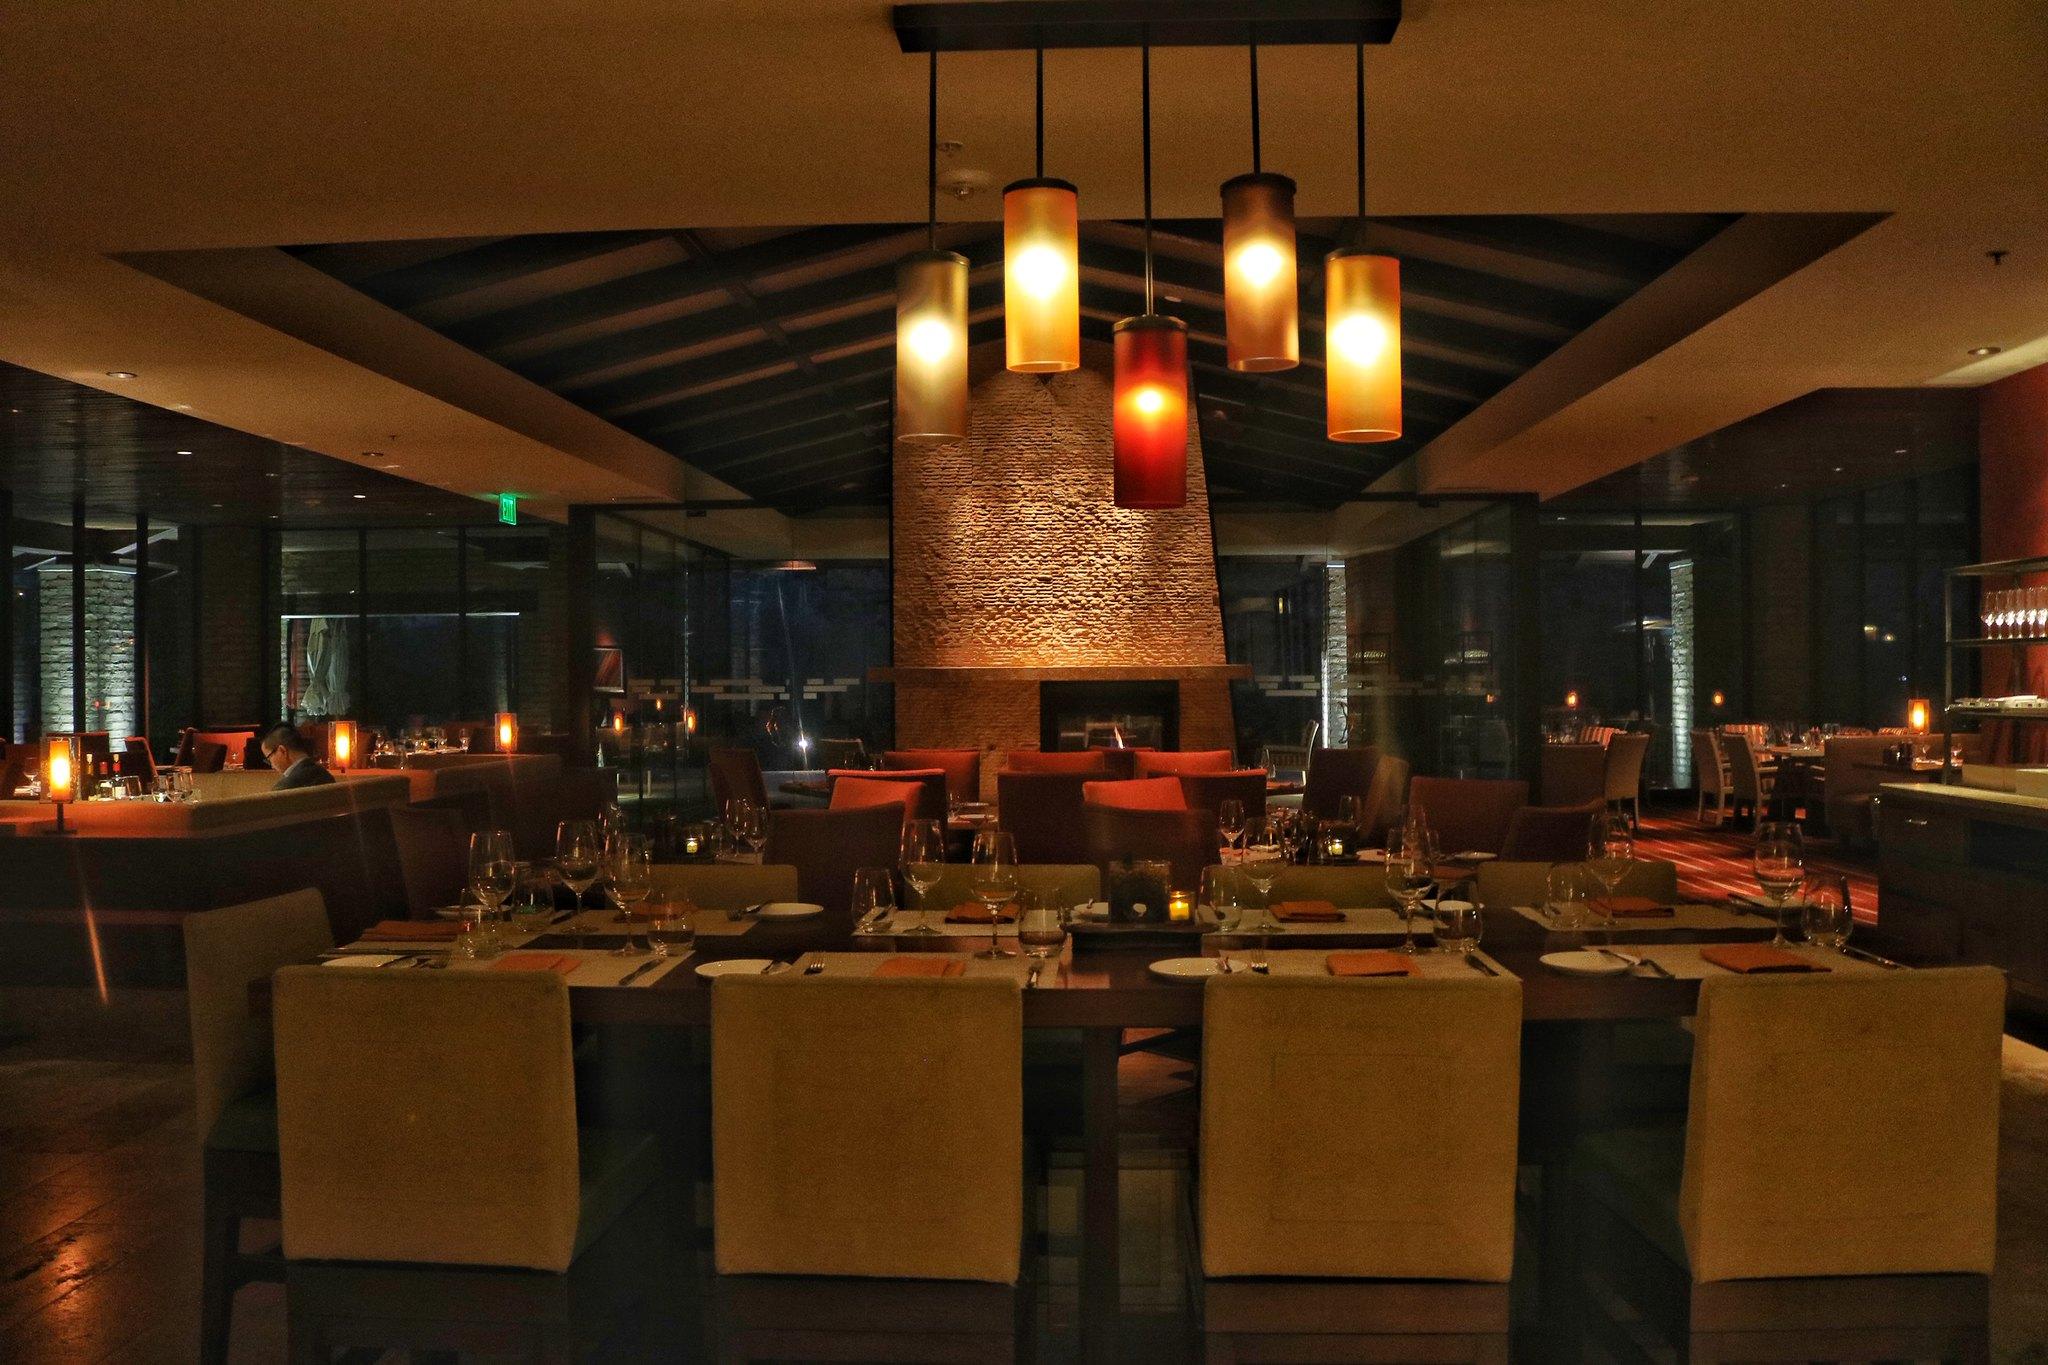 Ritz-Carlton, Dove Mountain Culinary Experience